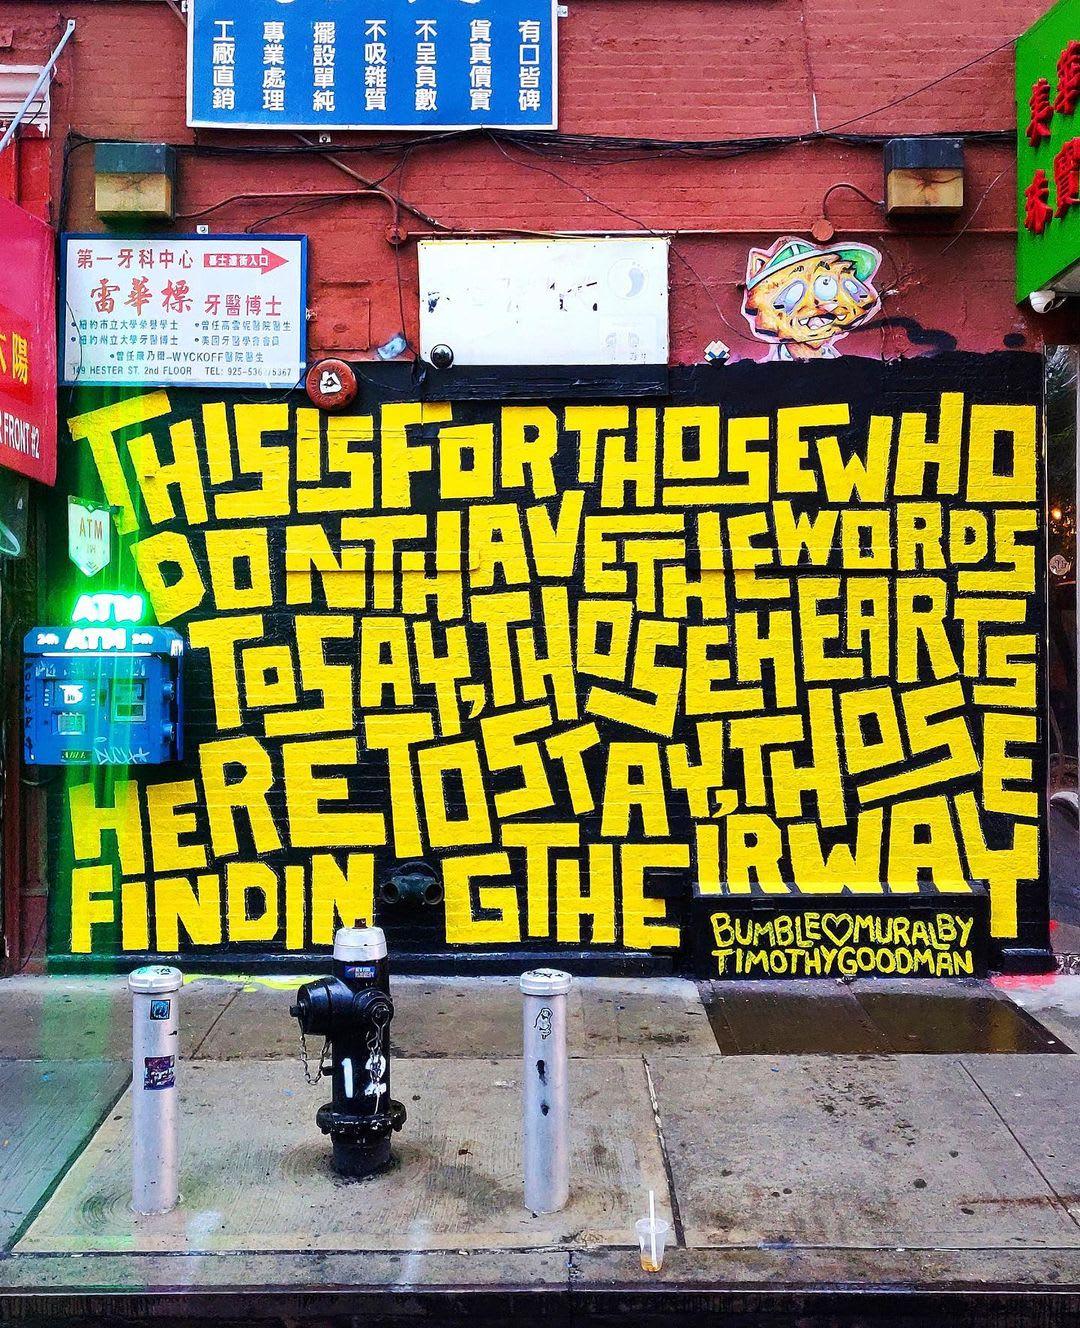 Œuvre Par Timothy Goodman à New York